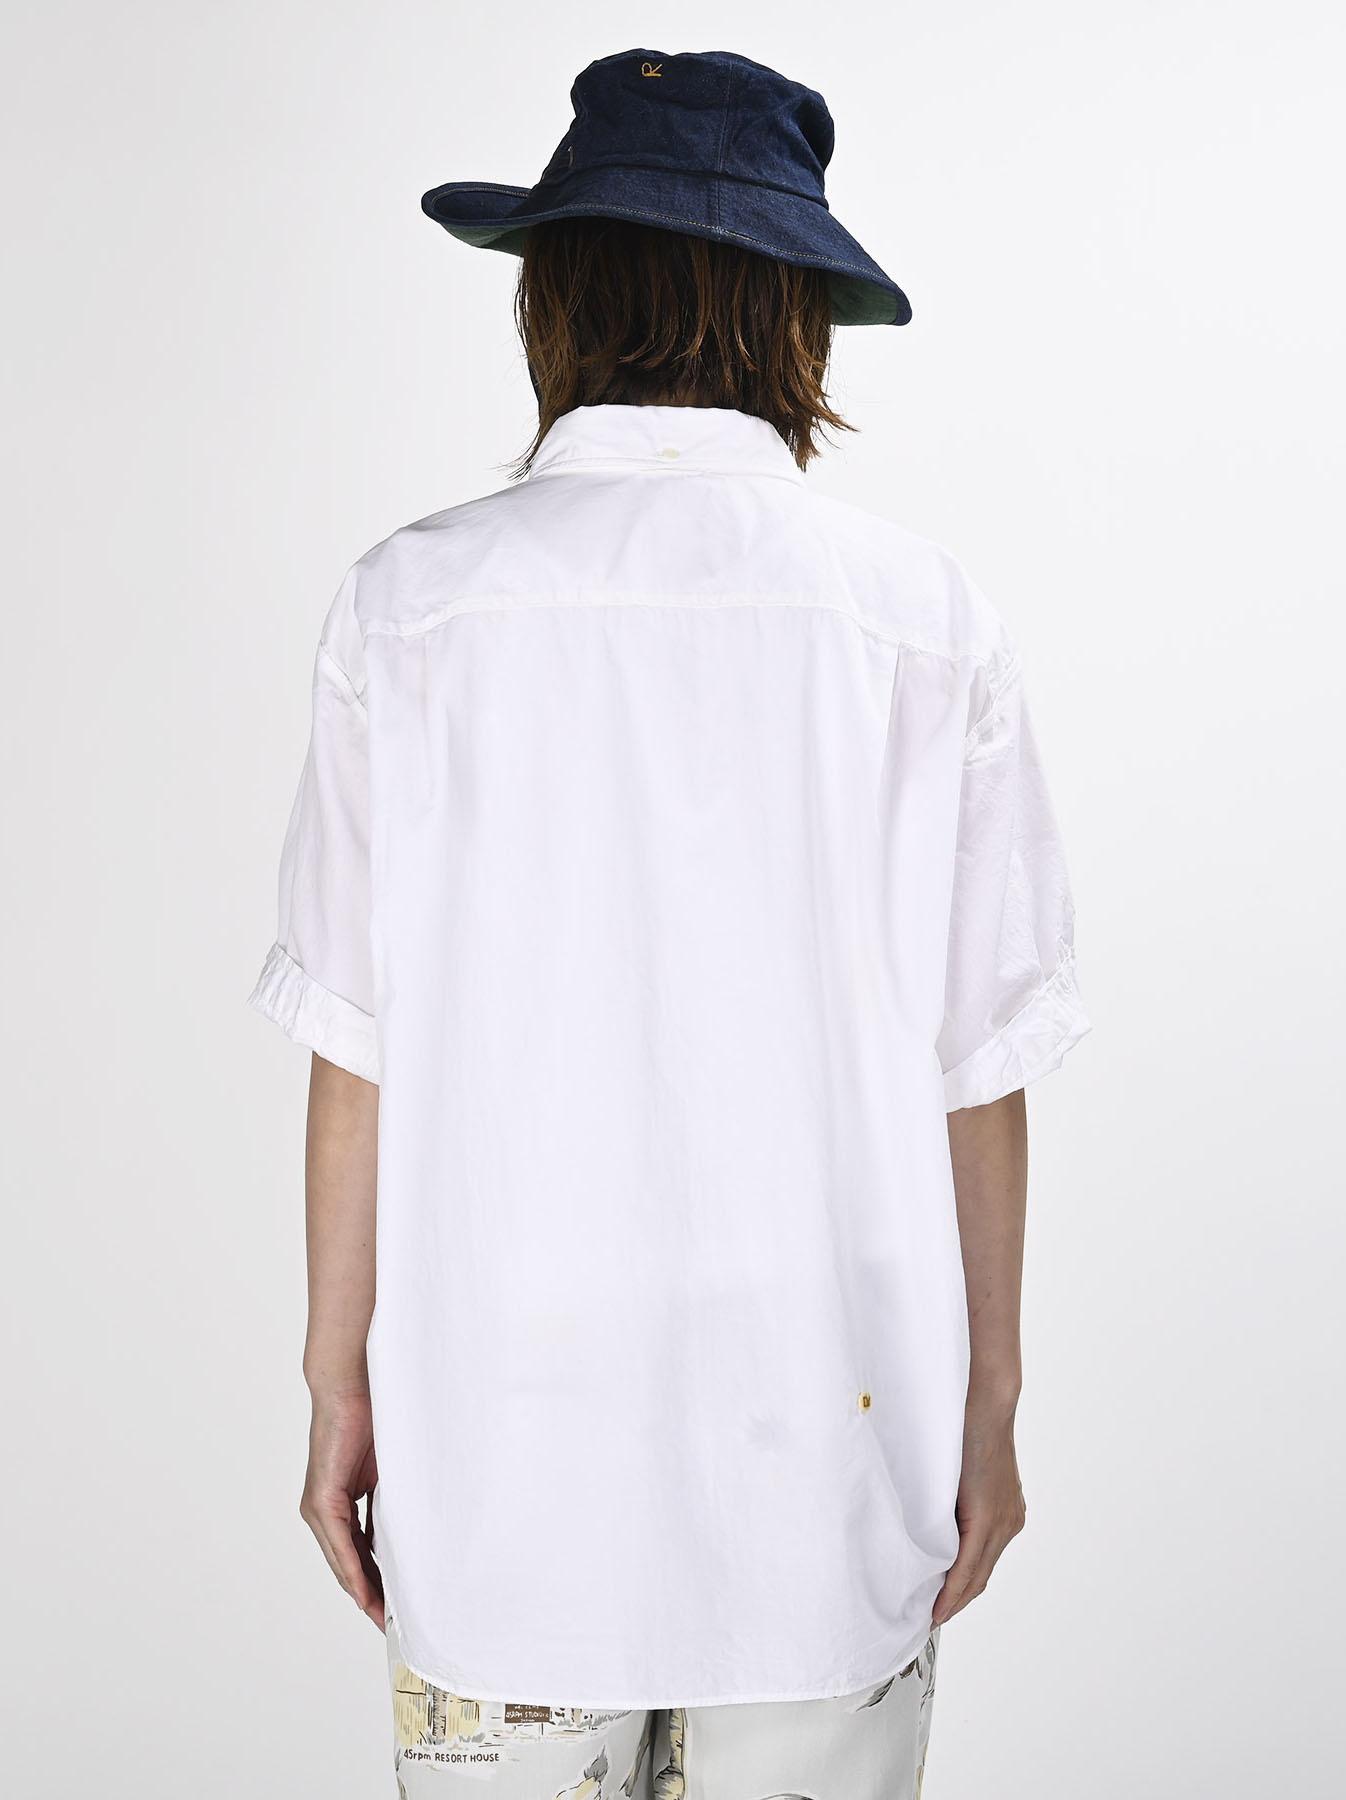 Damp Cotton Anuenue Ocean Shirt (0621)-11